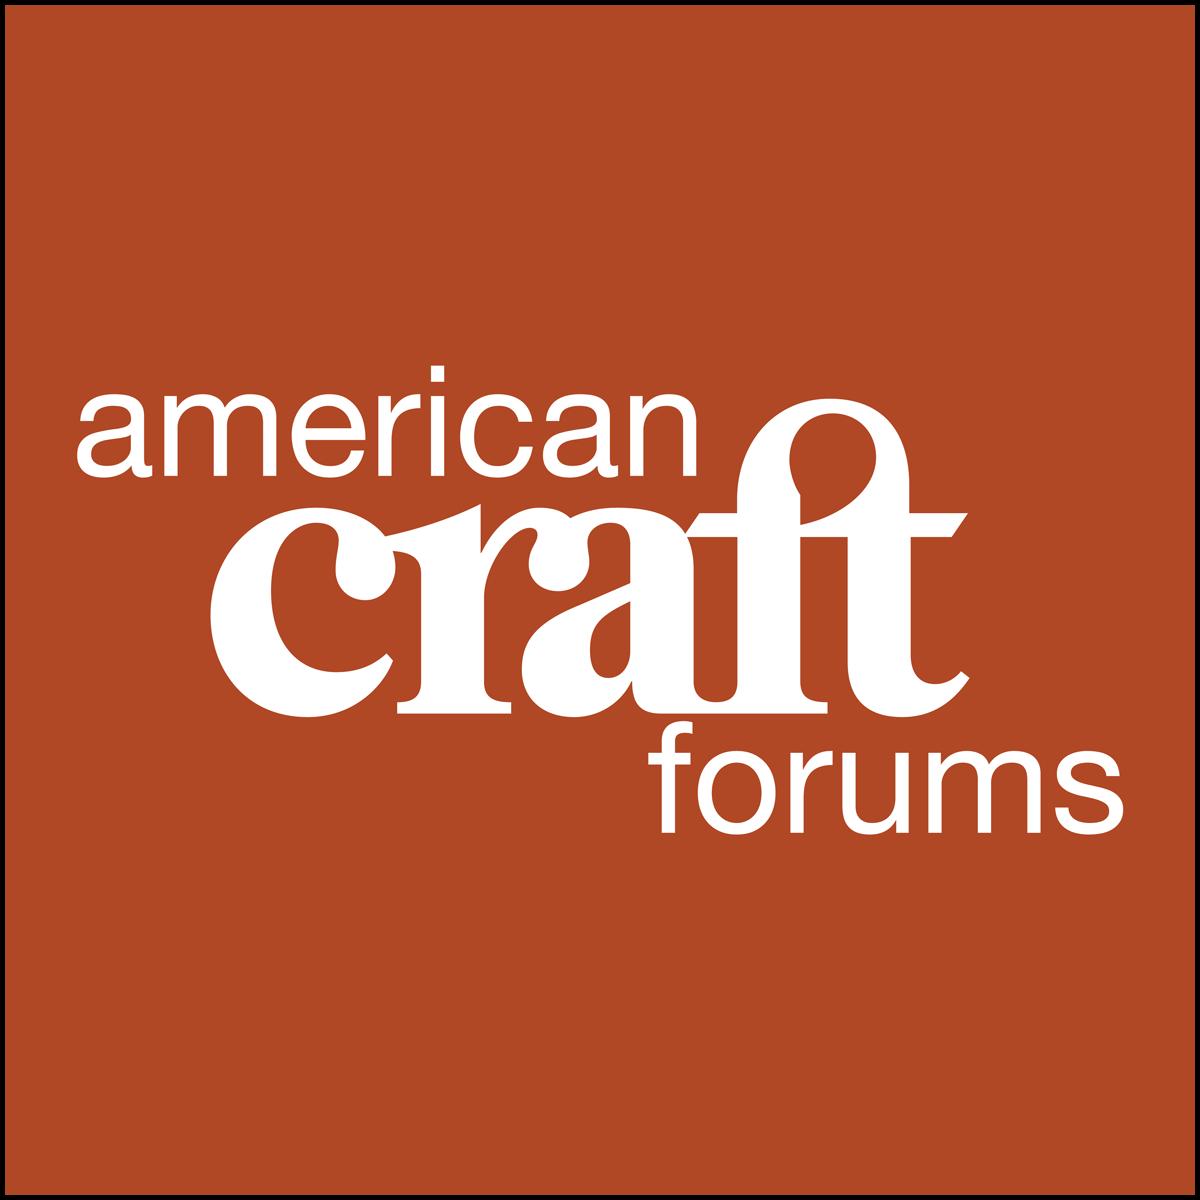 Fall 2021 American Craft Forums logo tile